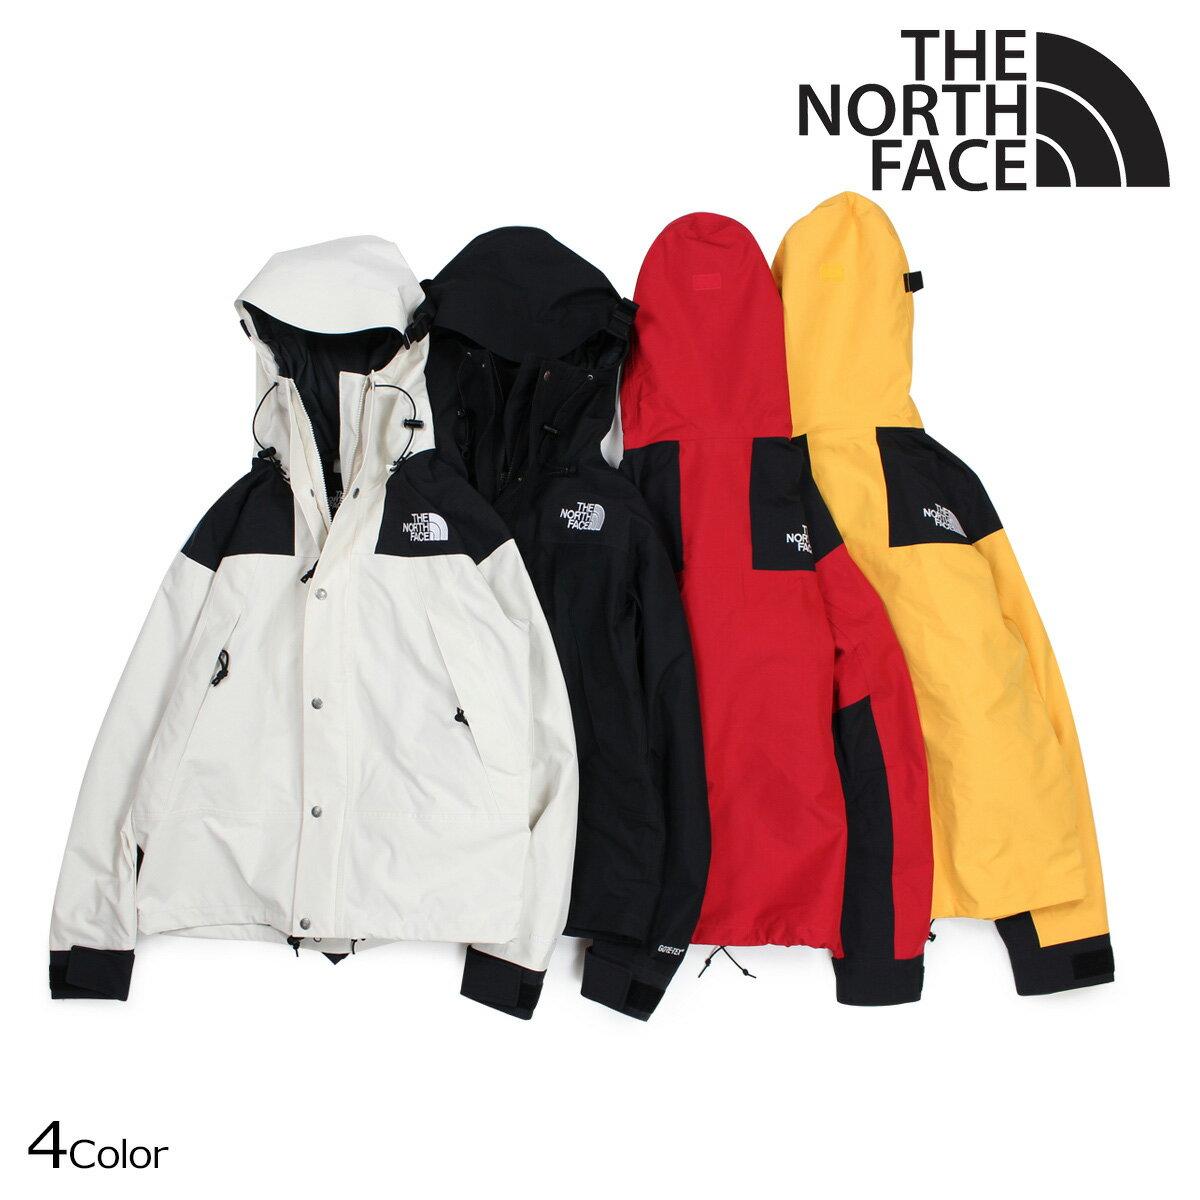 THE NORTH FACE MENS 1990 MOUNTAIN JACKET GTX ノースフェイス ジャケット マウンテンジャケット メンズ ゴアテックス NF0A3JPA